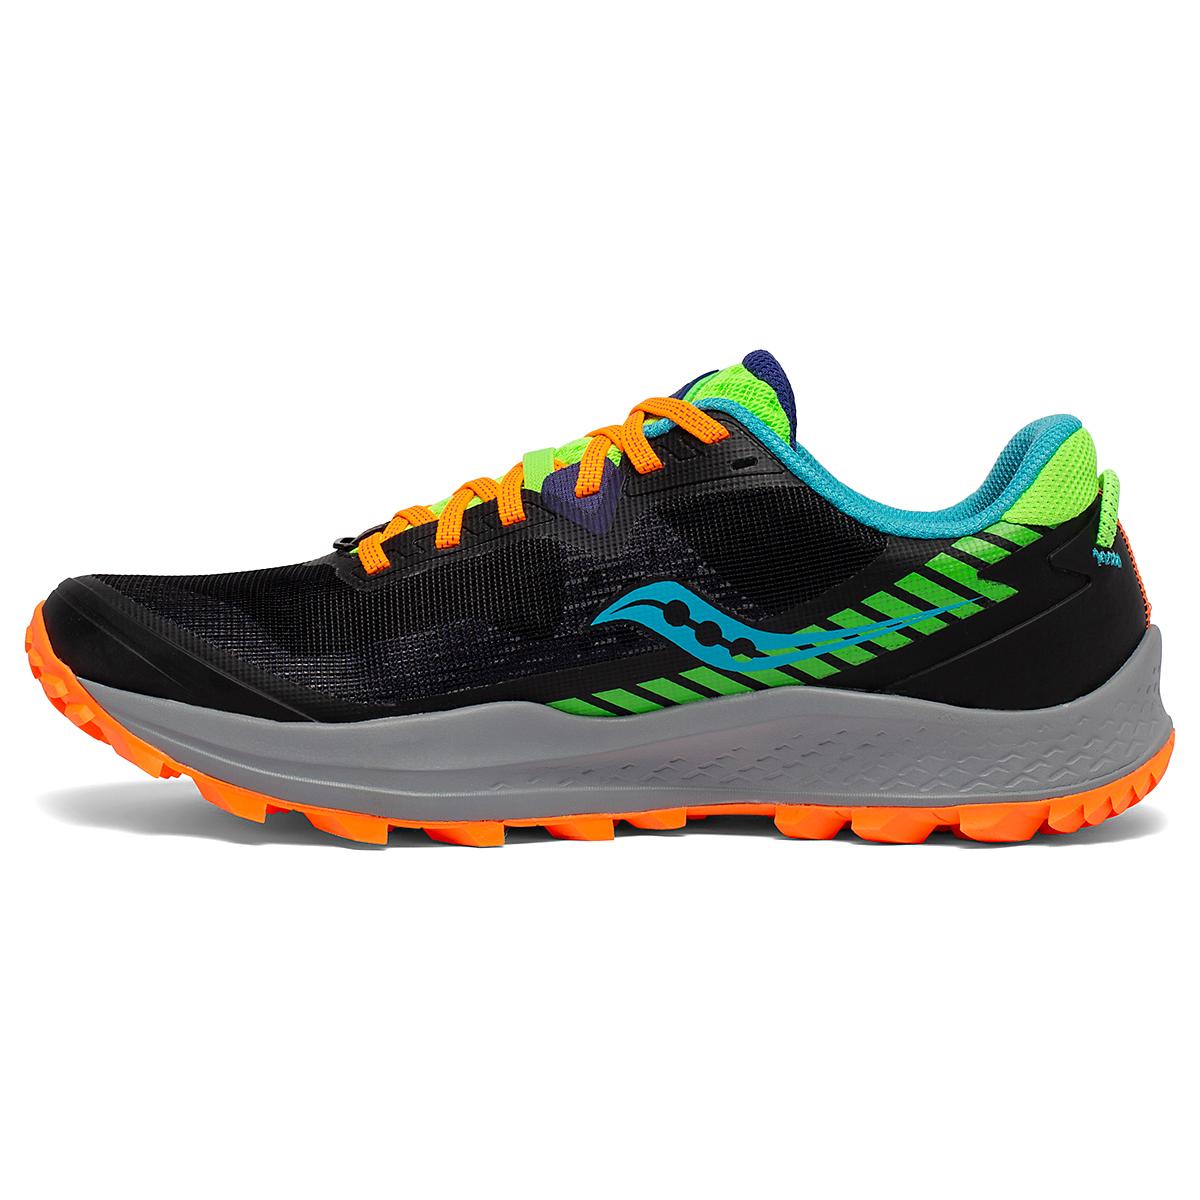 Men's Saucony Peregrine 11 Trail Running Shoe - Color: Future/Black - Size: 8 - Width: Regular, Future/Black, large, image 2